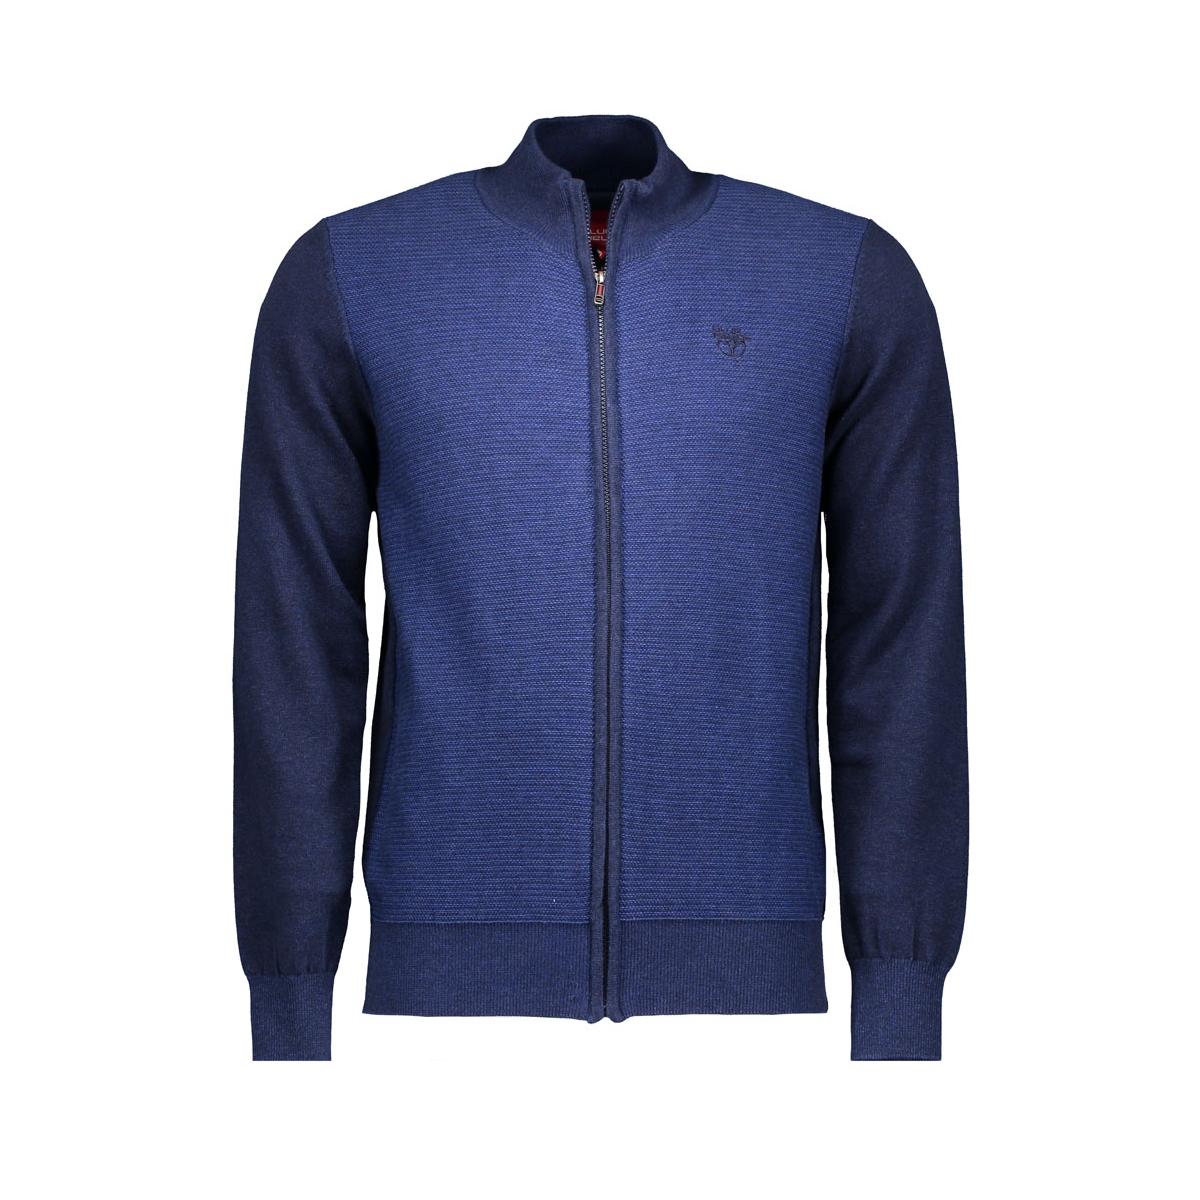 16435011 bluefields vest 5857